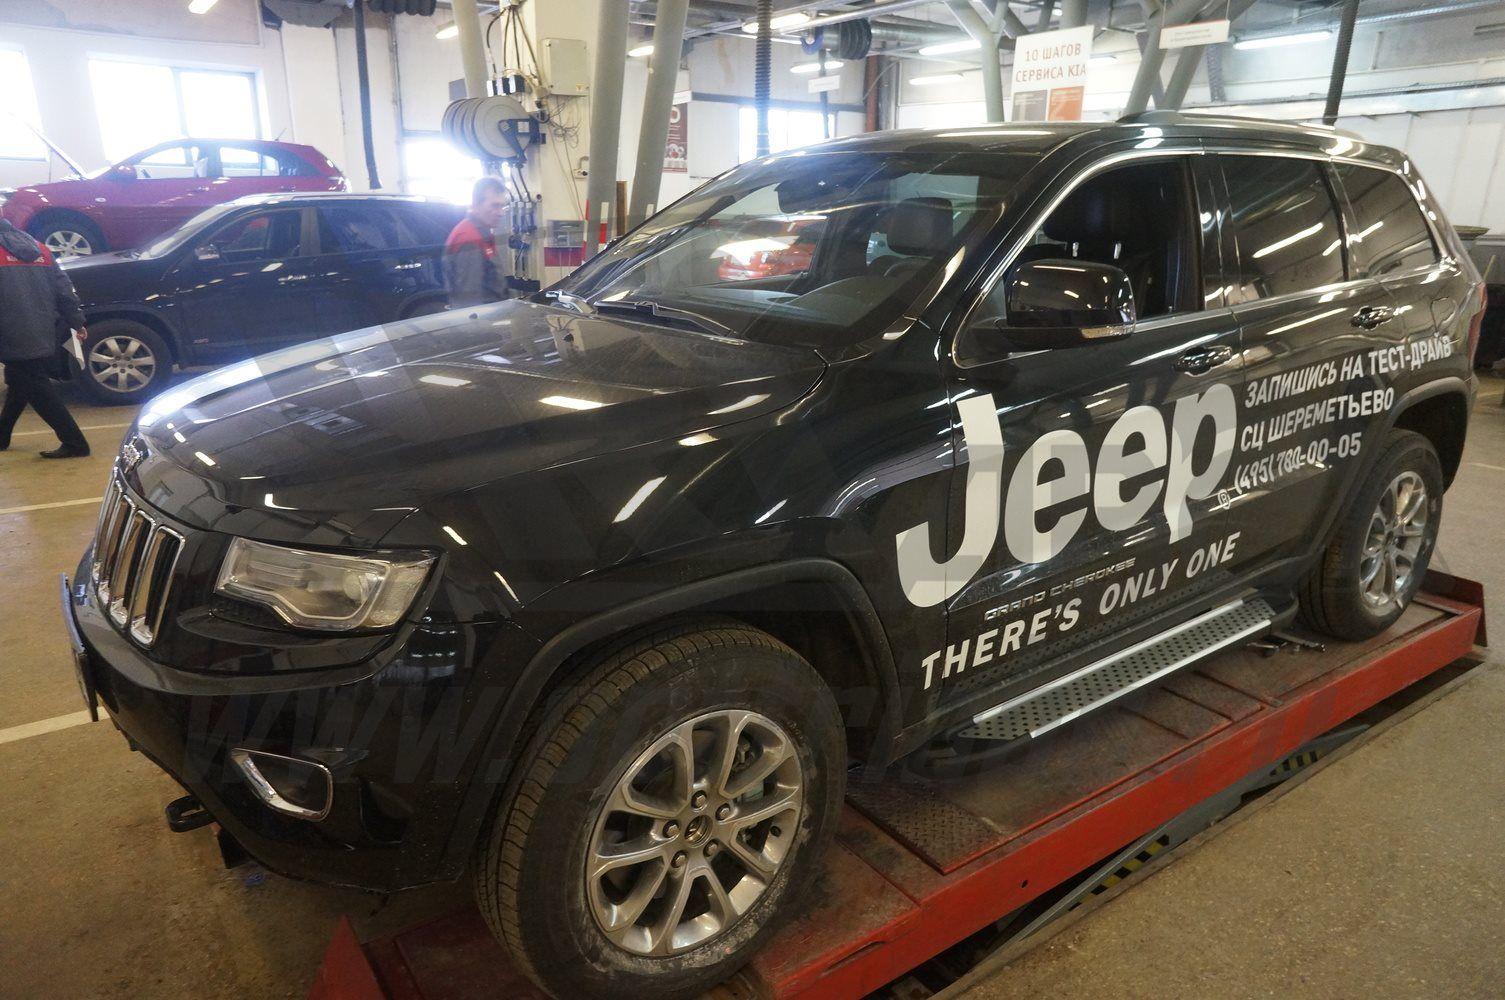 Пороги CAN OTOMOTIV алюминиевые (Sapphire Silver) Jeep Gr. Cherokee (2011-) (кроме SRT) от Ravta